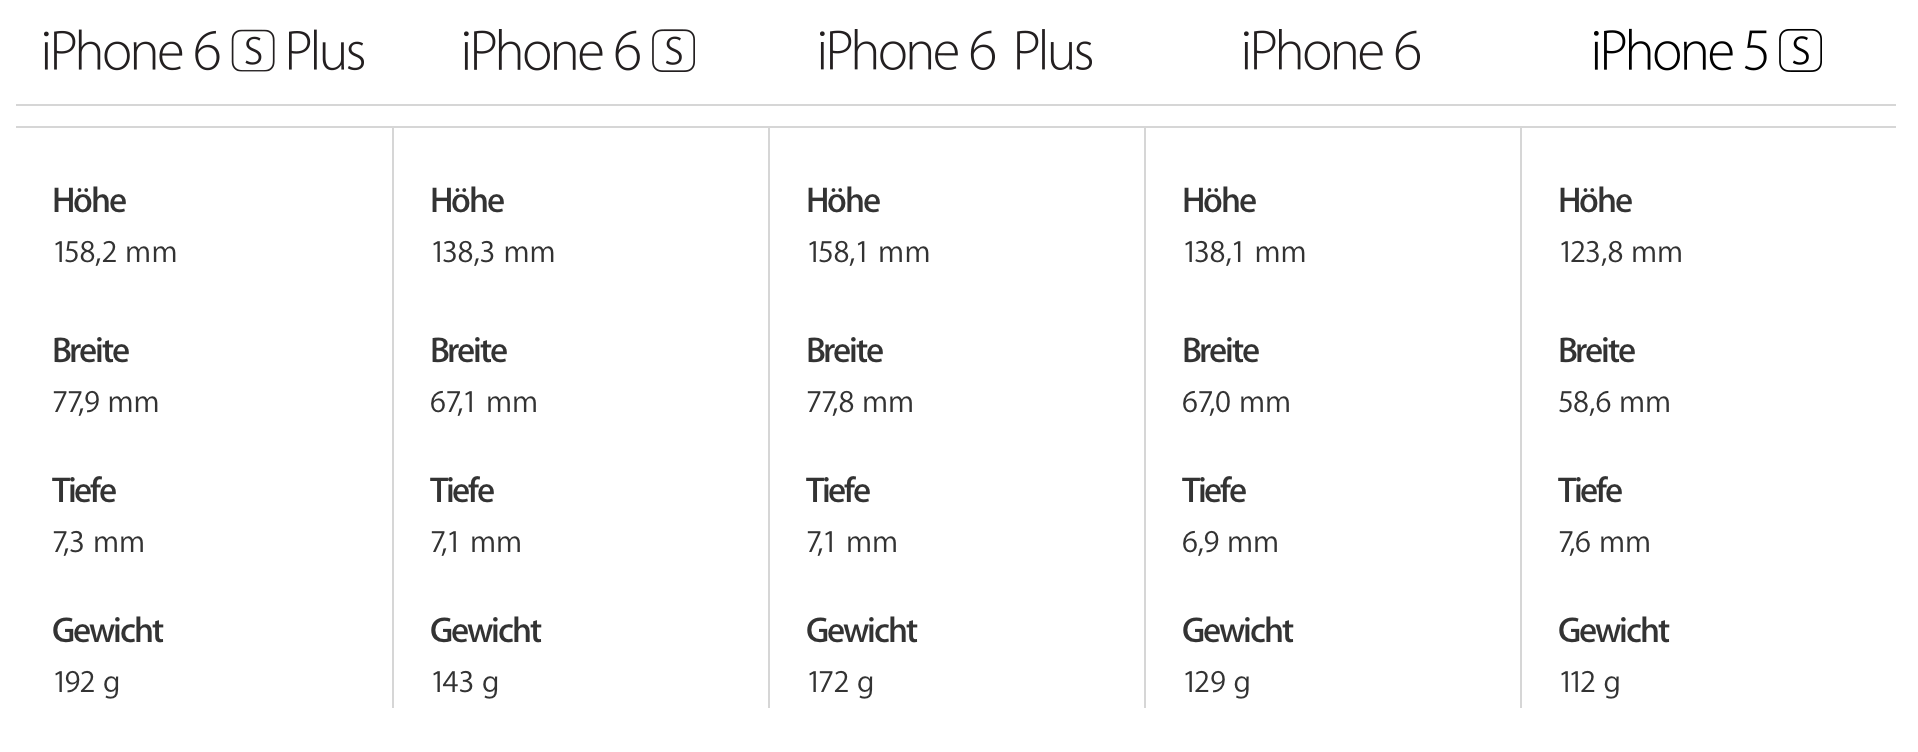 iPhone 6S und 6S Plus - Cases, Hüllen, Taschen etc...-bildschirmfoto-2015-09-09-um-23.20.42.png